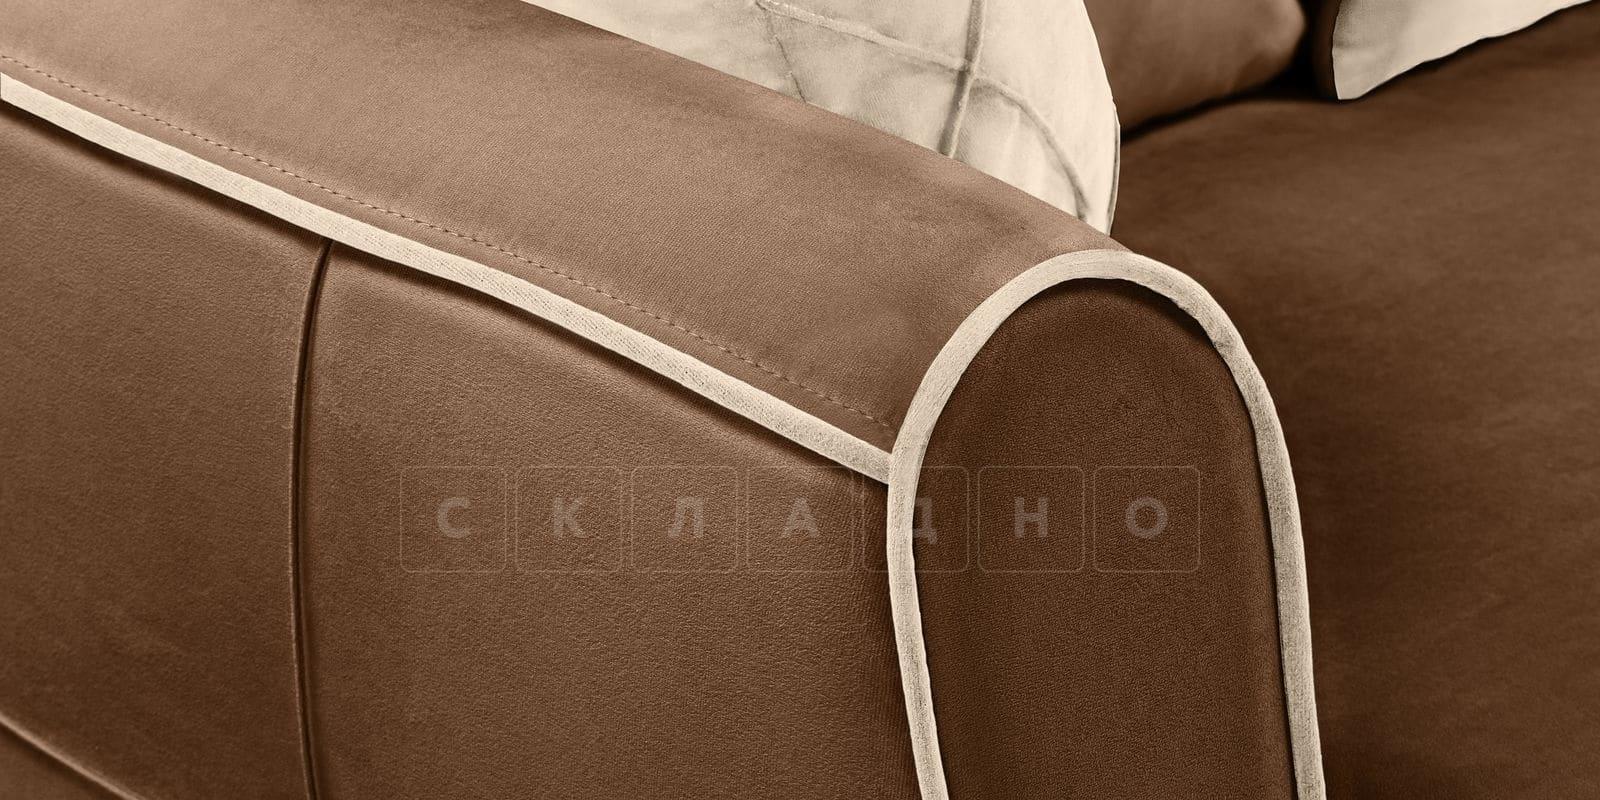 Диван Флэтфорд велюр коричневый фото 8 | интернет-магазин Складно